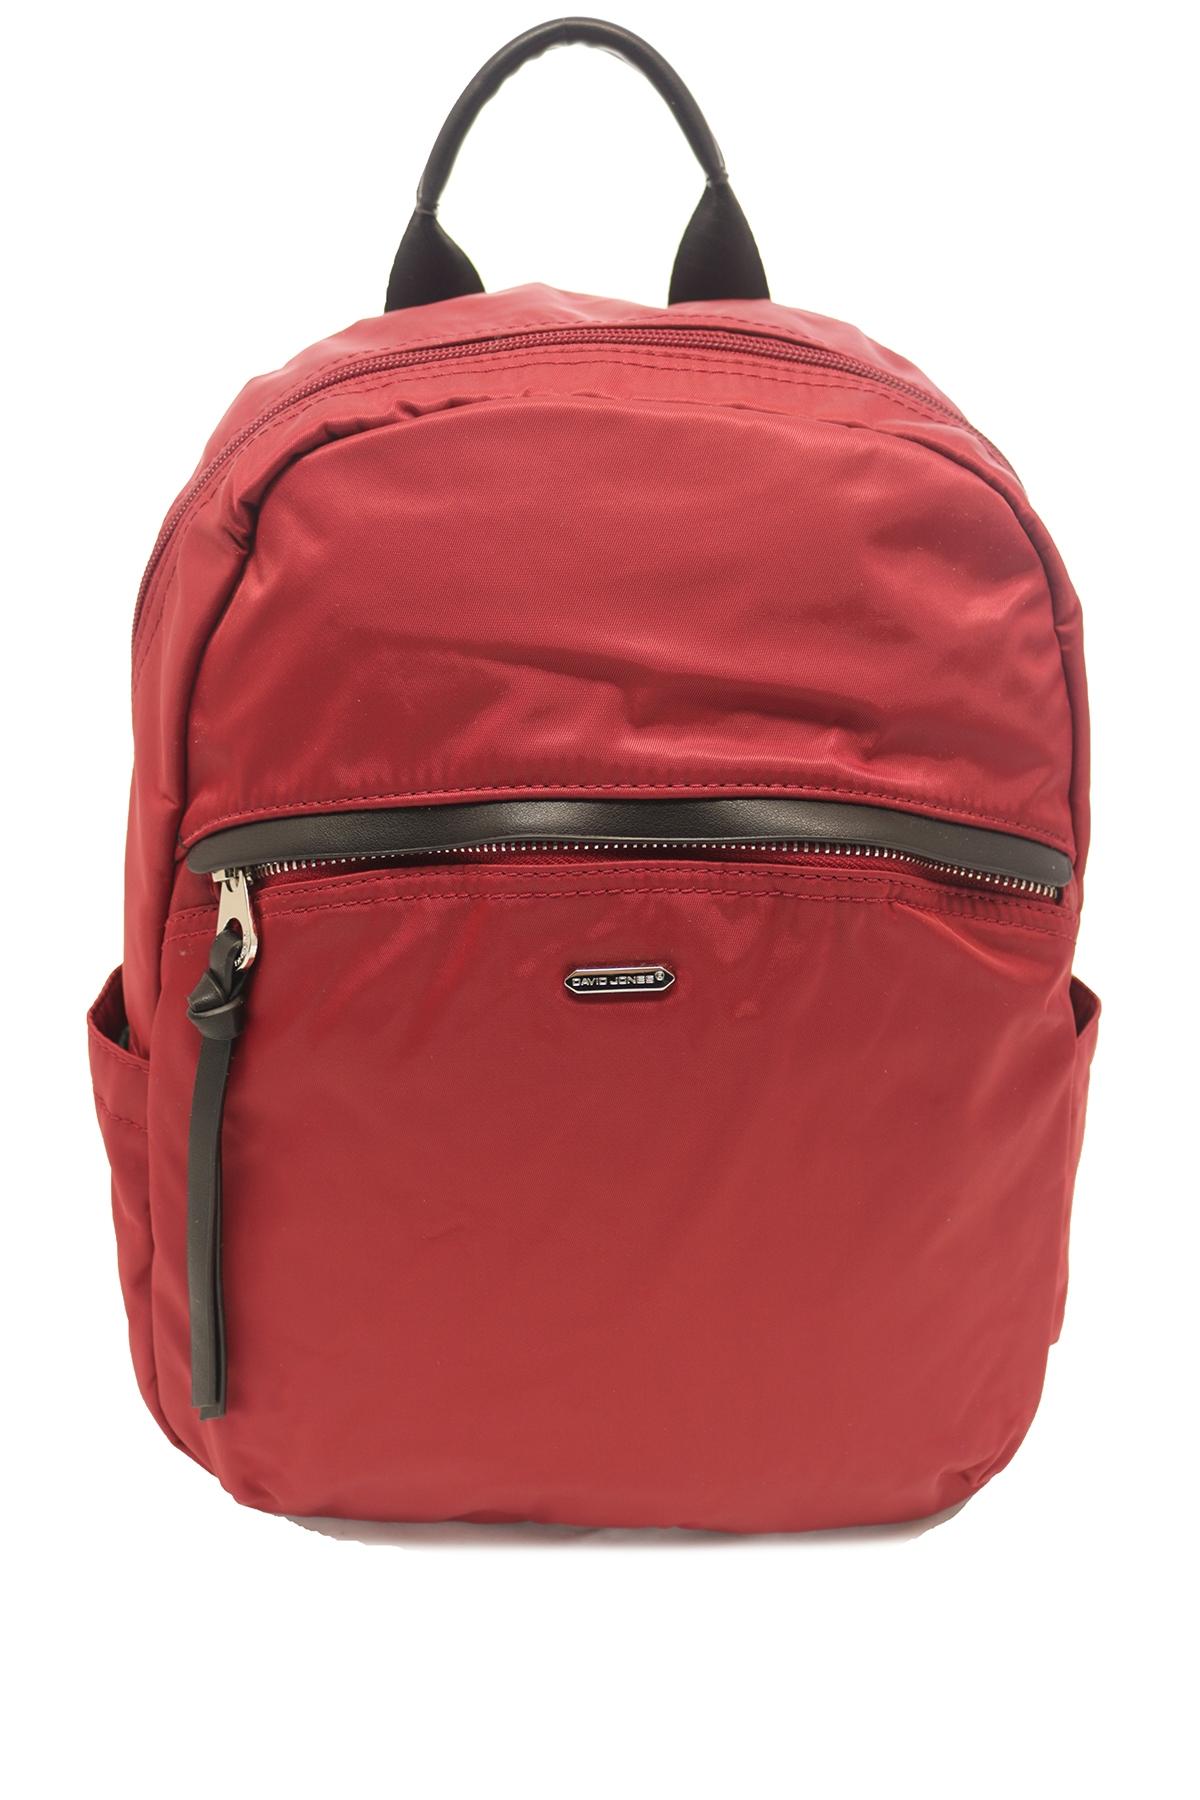 Рюкзак David Jones 6500-3 оптом